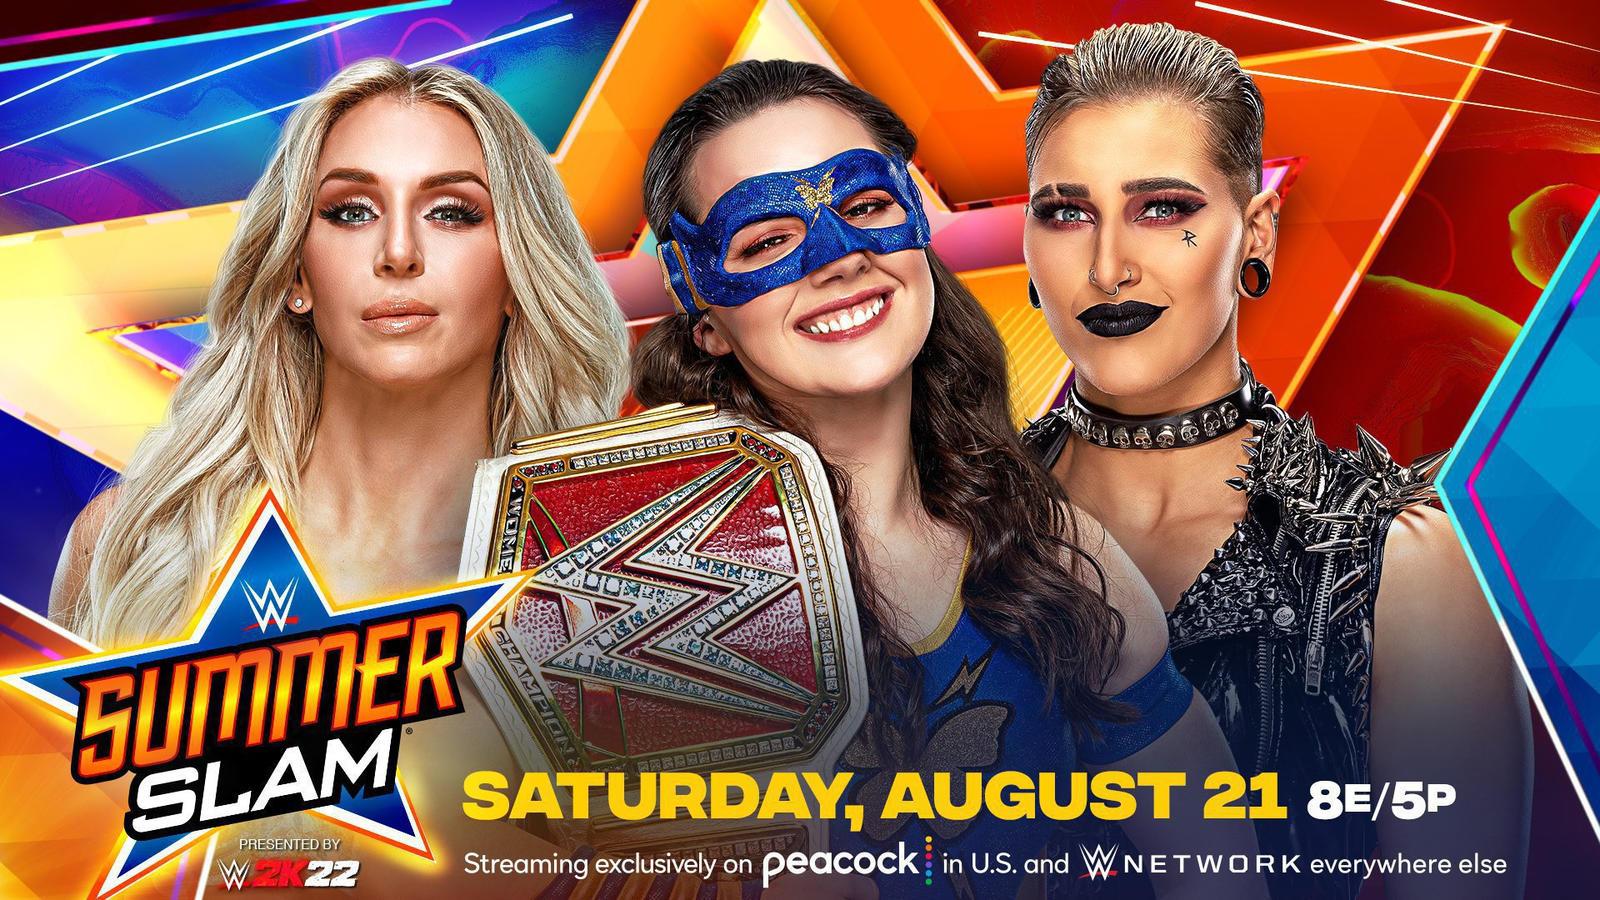 WWE Summerslam 2021: Triple Threat Championship Match Announced 1